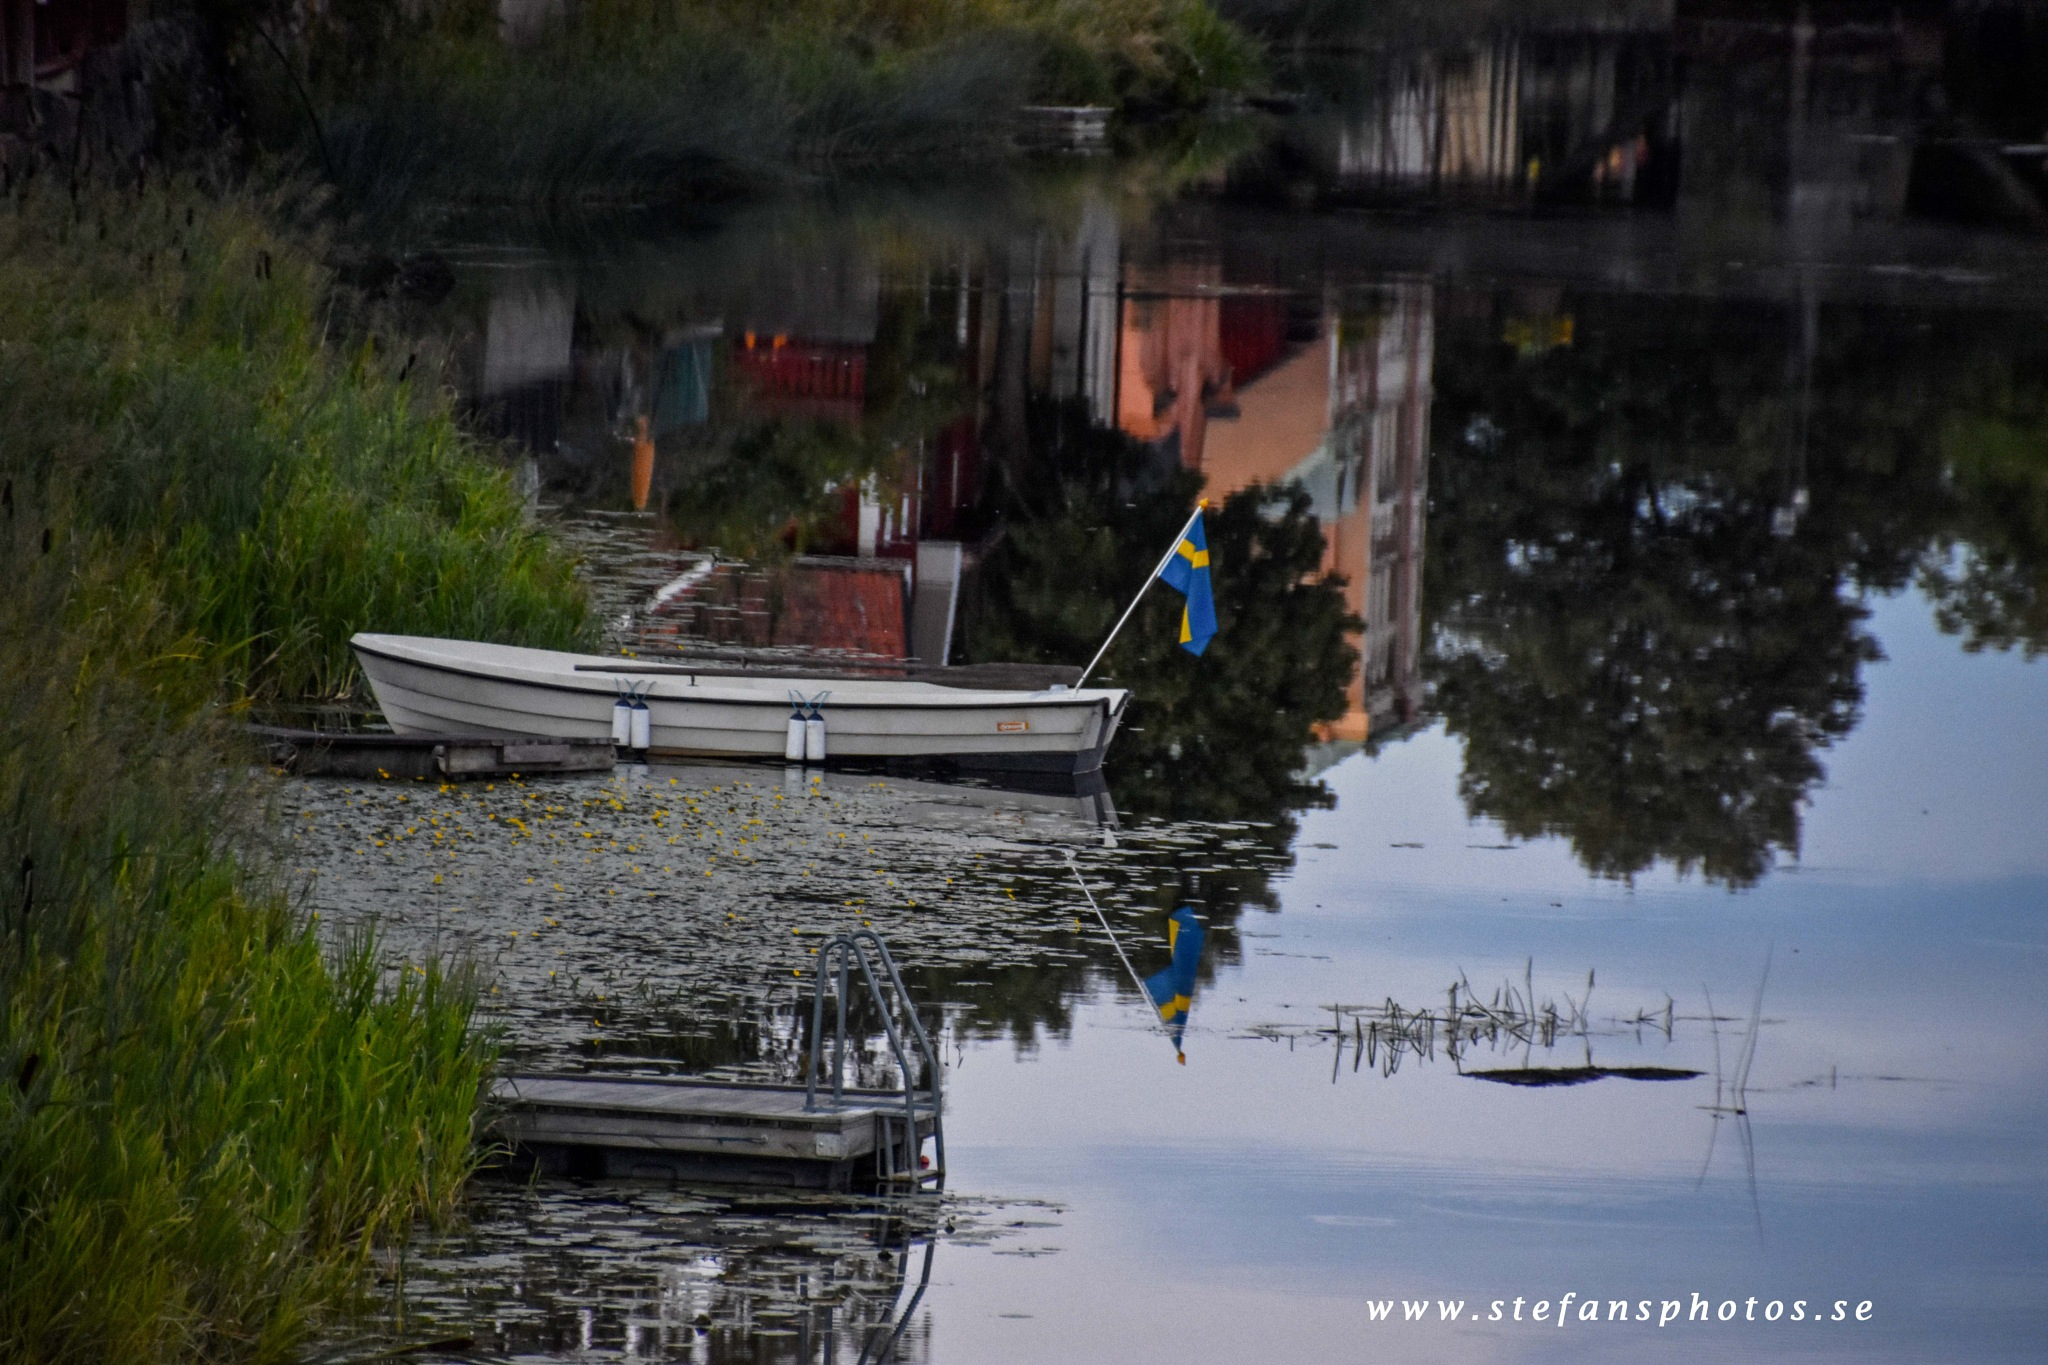 Summer at Arbogaån by stefan pettersson